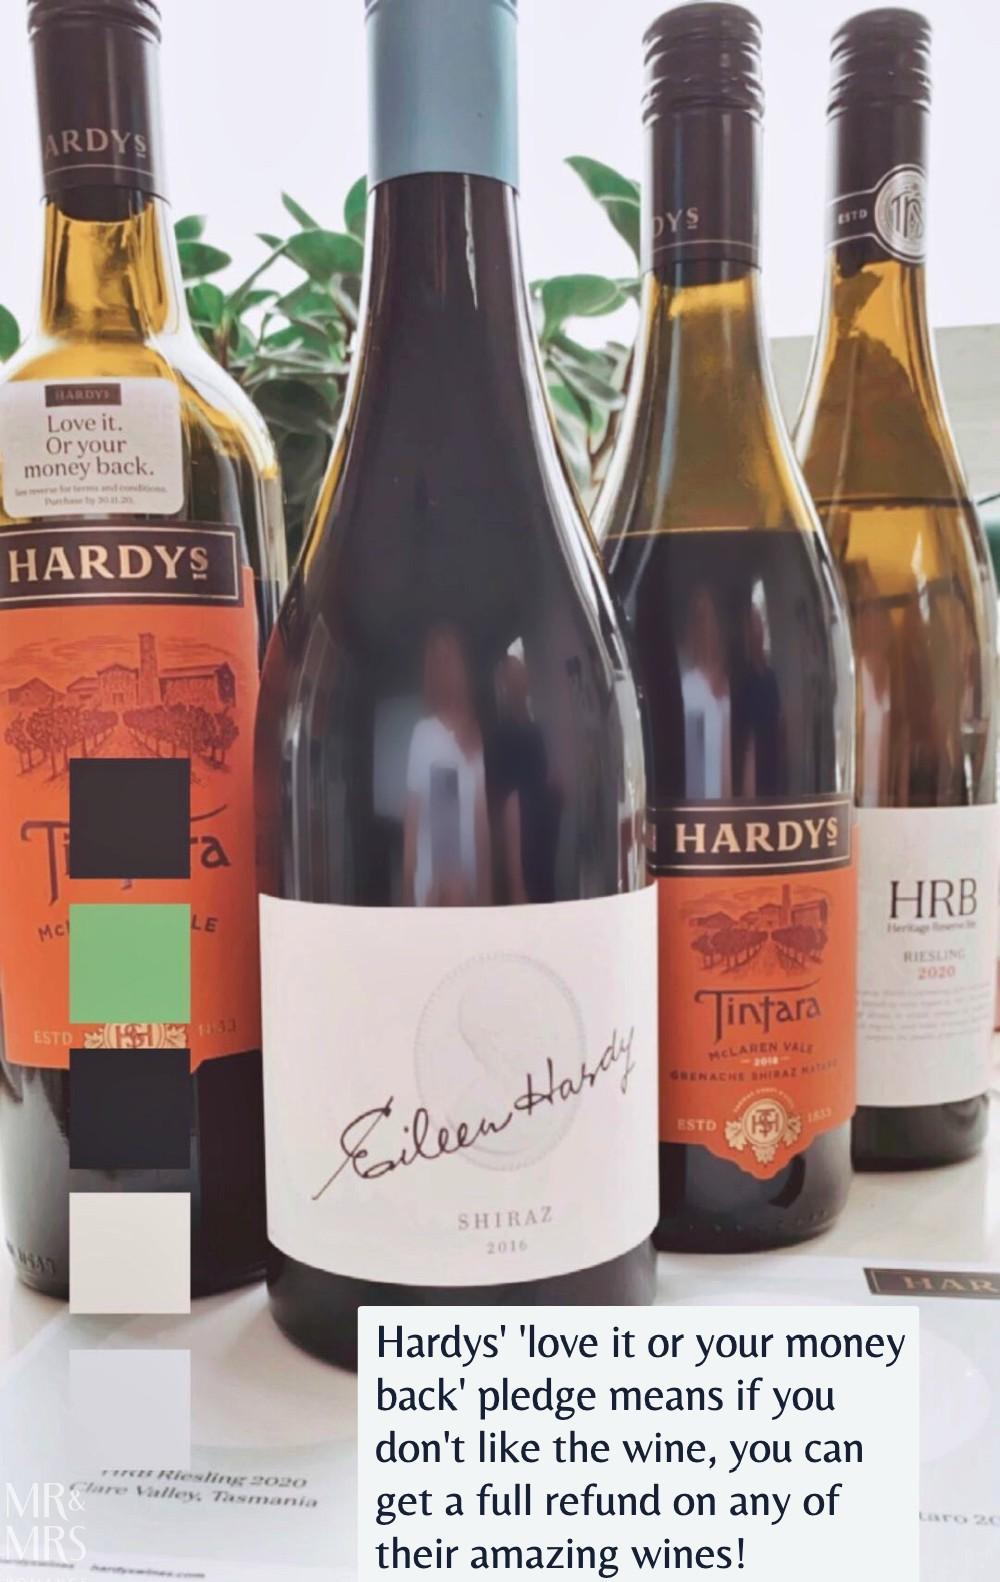 Hardys Wines' love it or your money back pledge